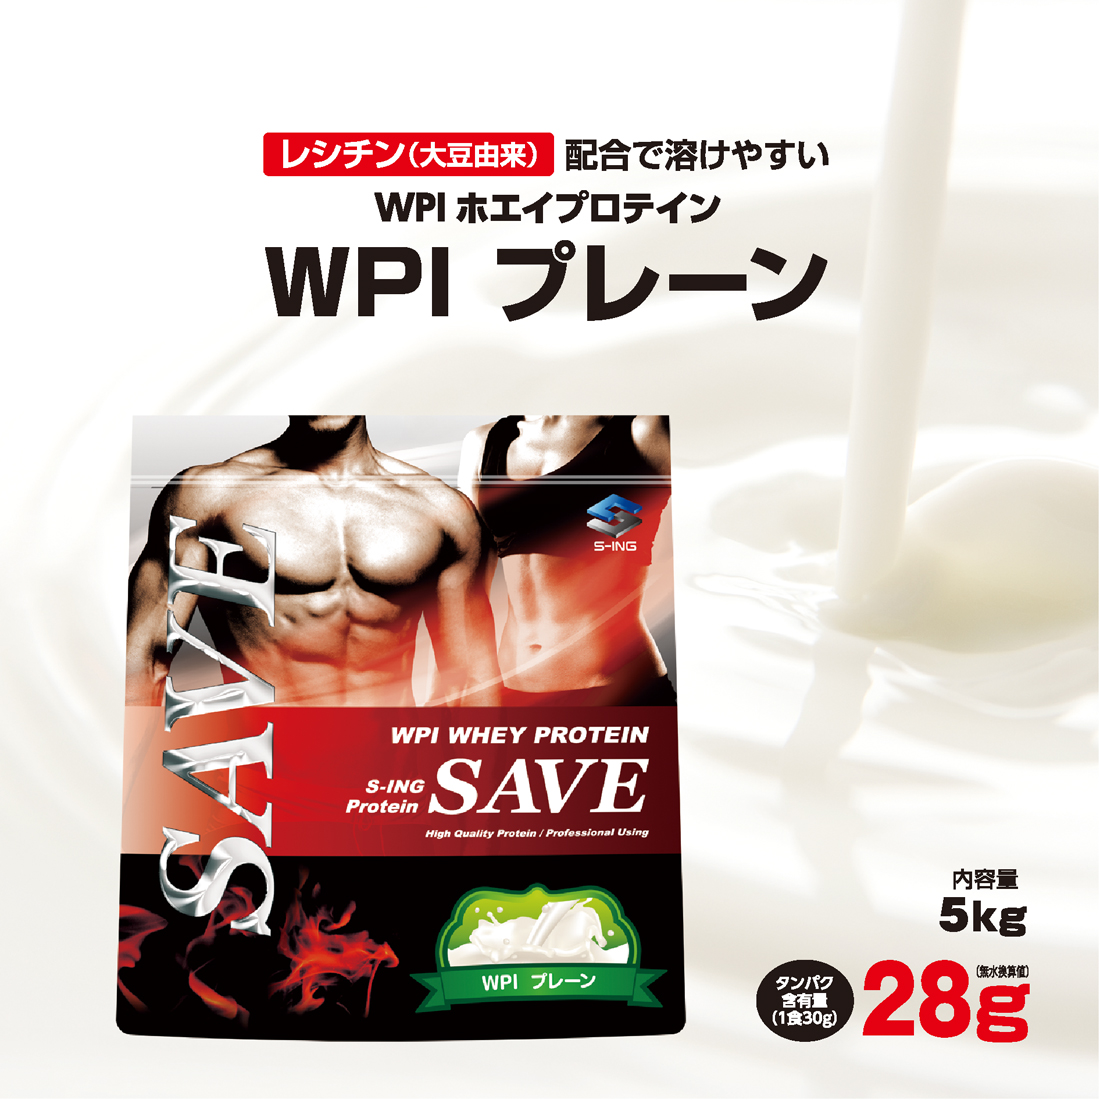 SAVEプロテイン プロフェッショナルシリーズ 最安値 豊富な品 に挑戦中 WPI ホエイプロテイン 出色 5kg 国産 激安 送料無料 人口甘味料 無添加 プレーン 香料